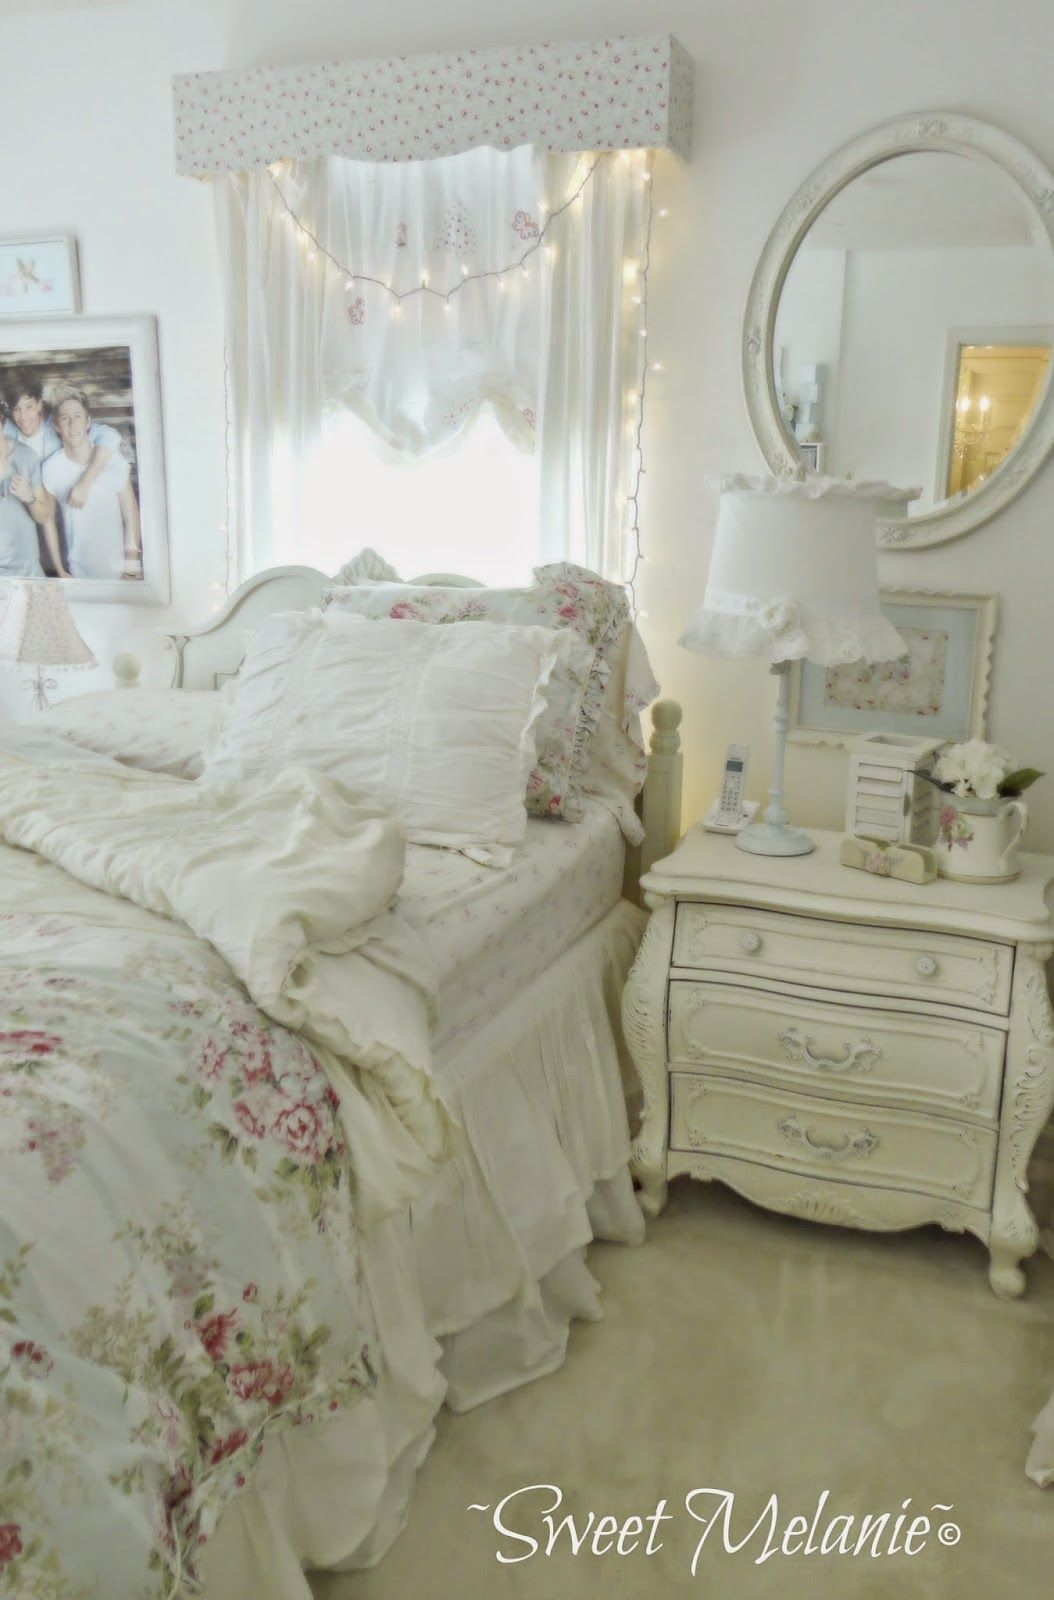 sweet melanie~: as if i need more furniture | amazing | pinterest, Modern haus